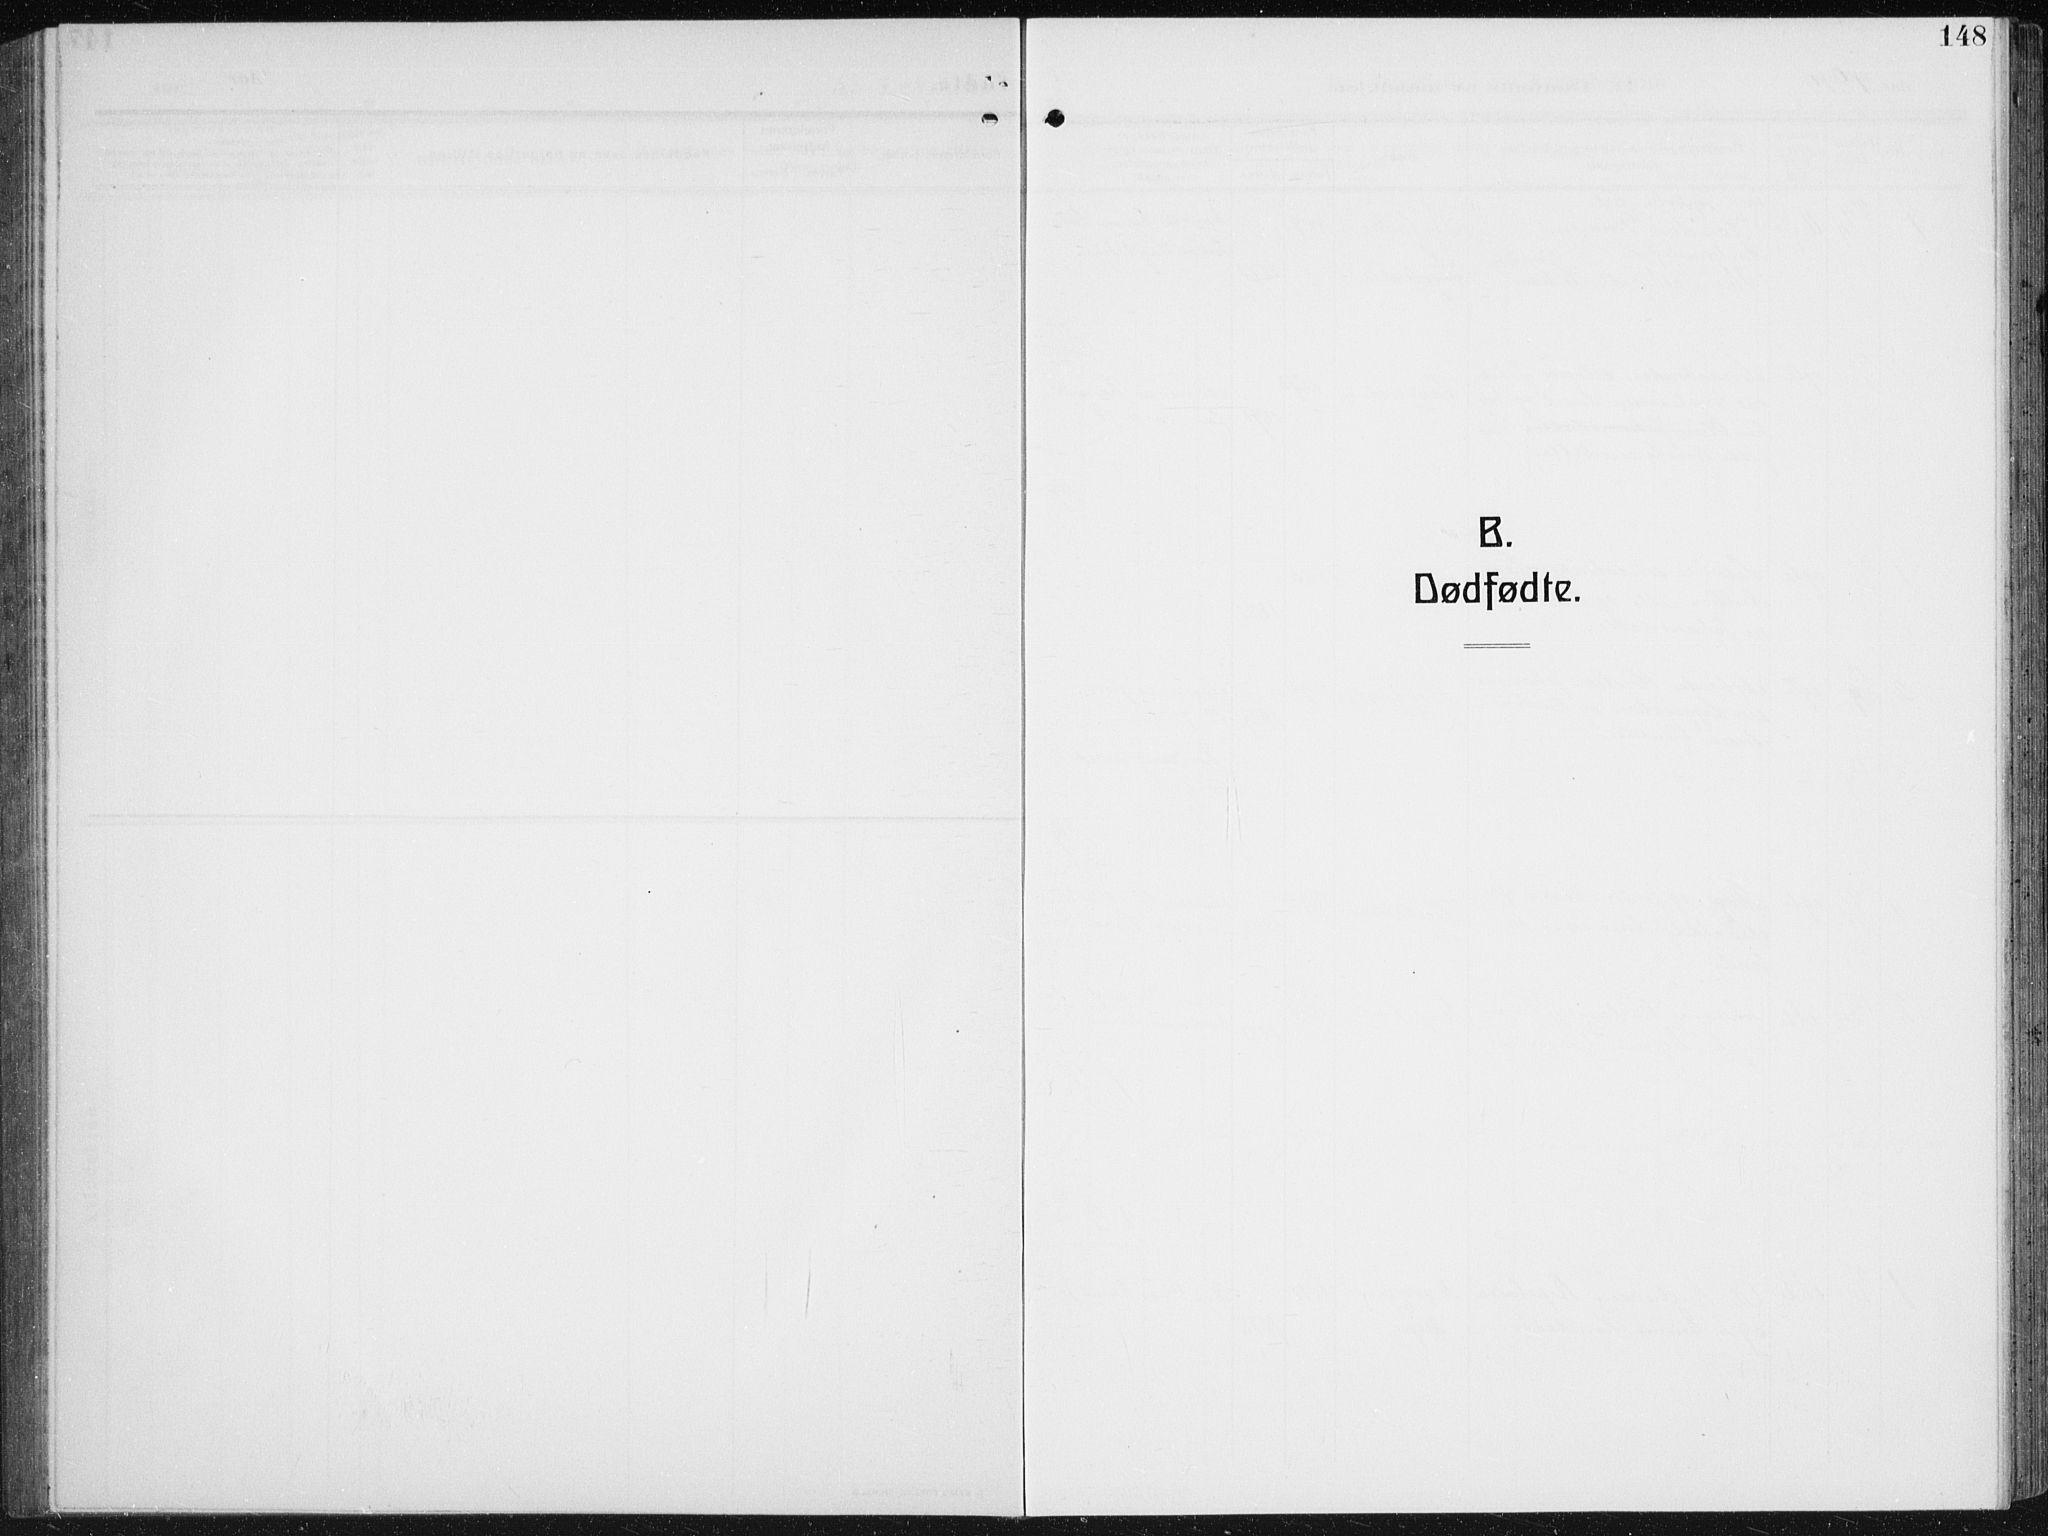 SAH, Biri prestekontor, Klokkerbok nr. 6, 1909-1938, s. 148